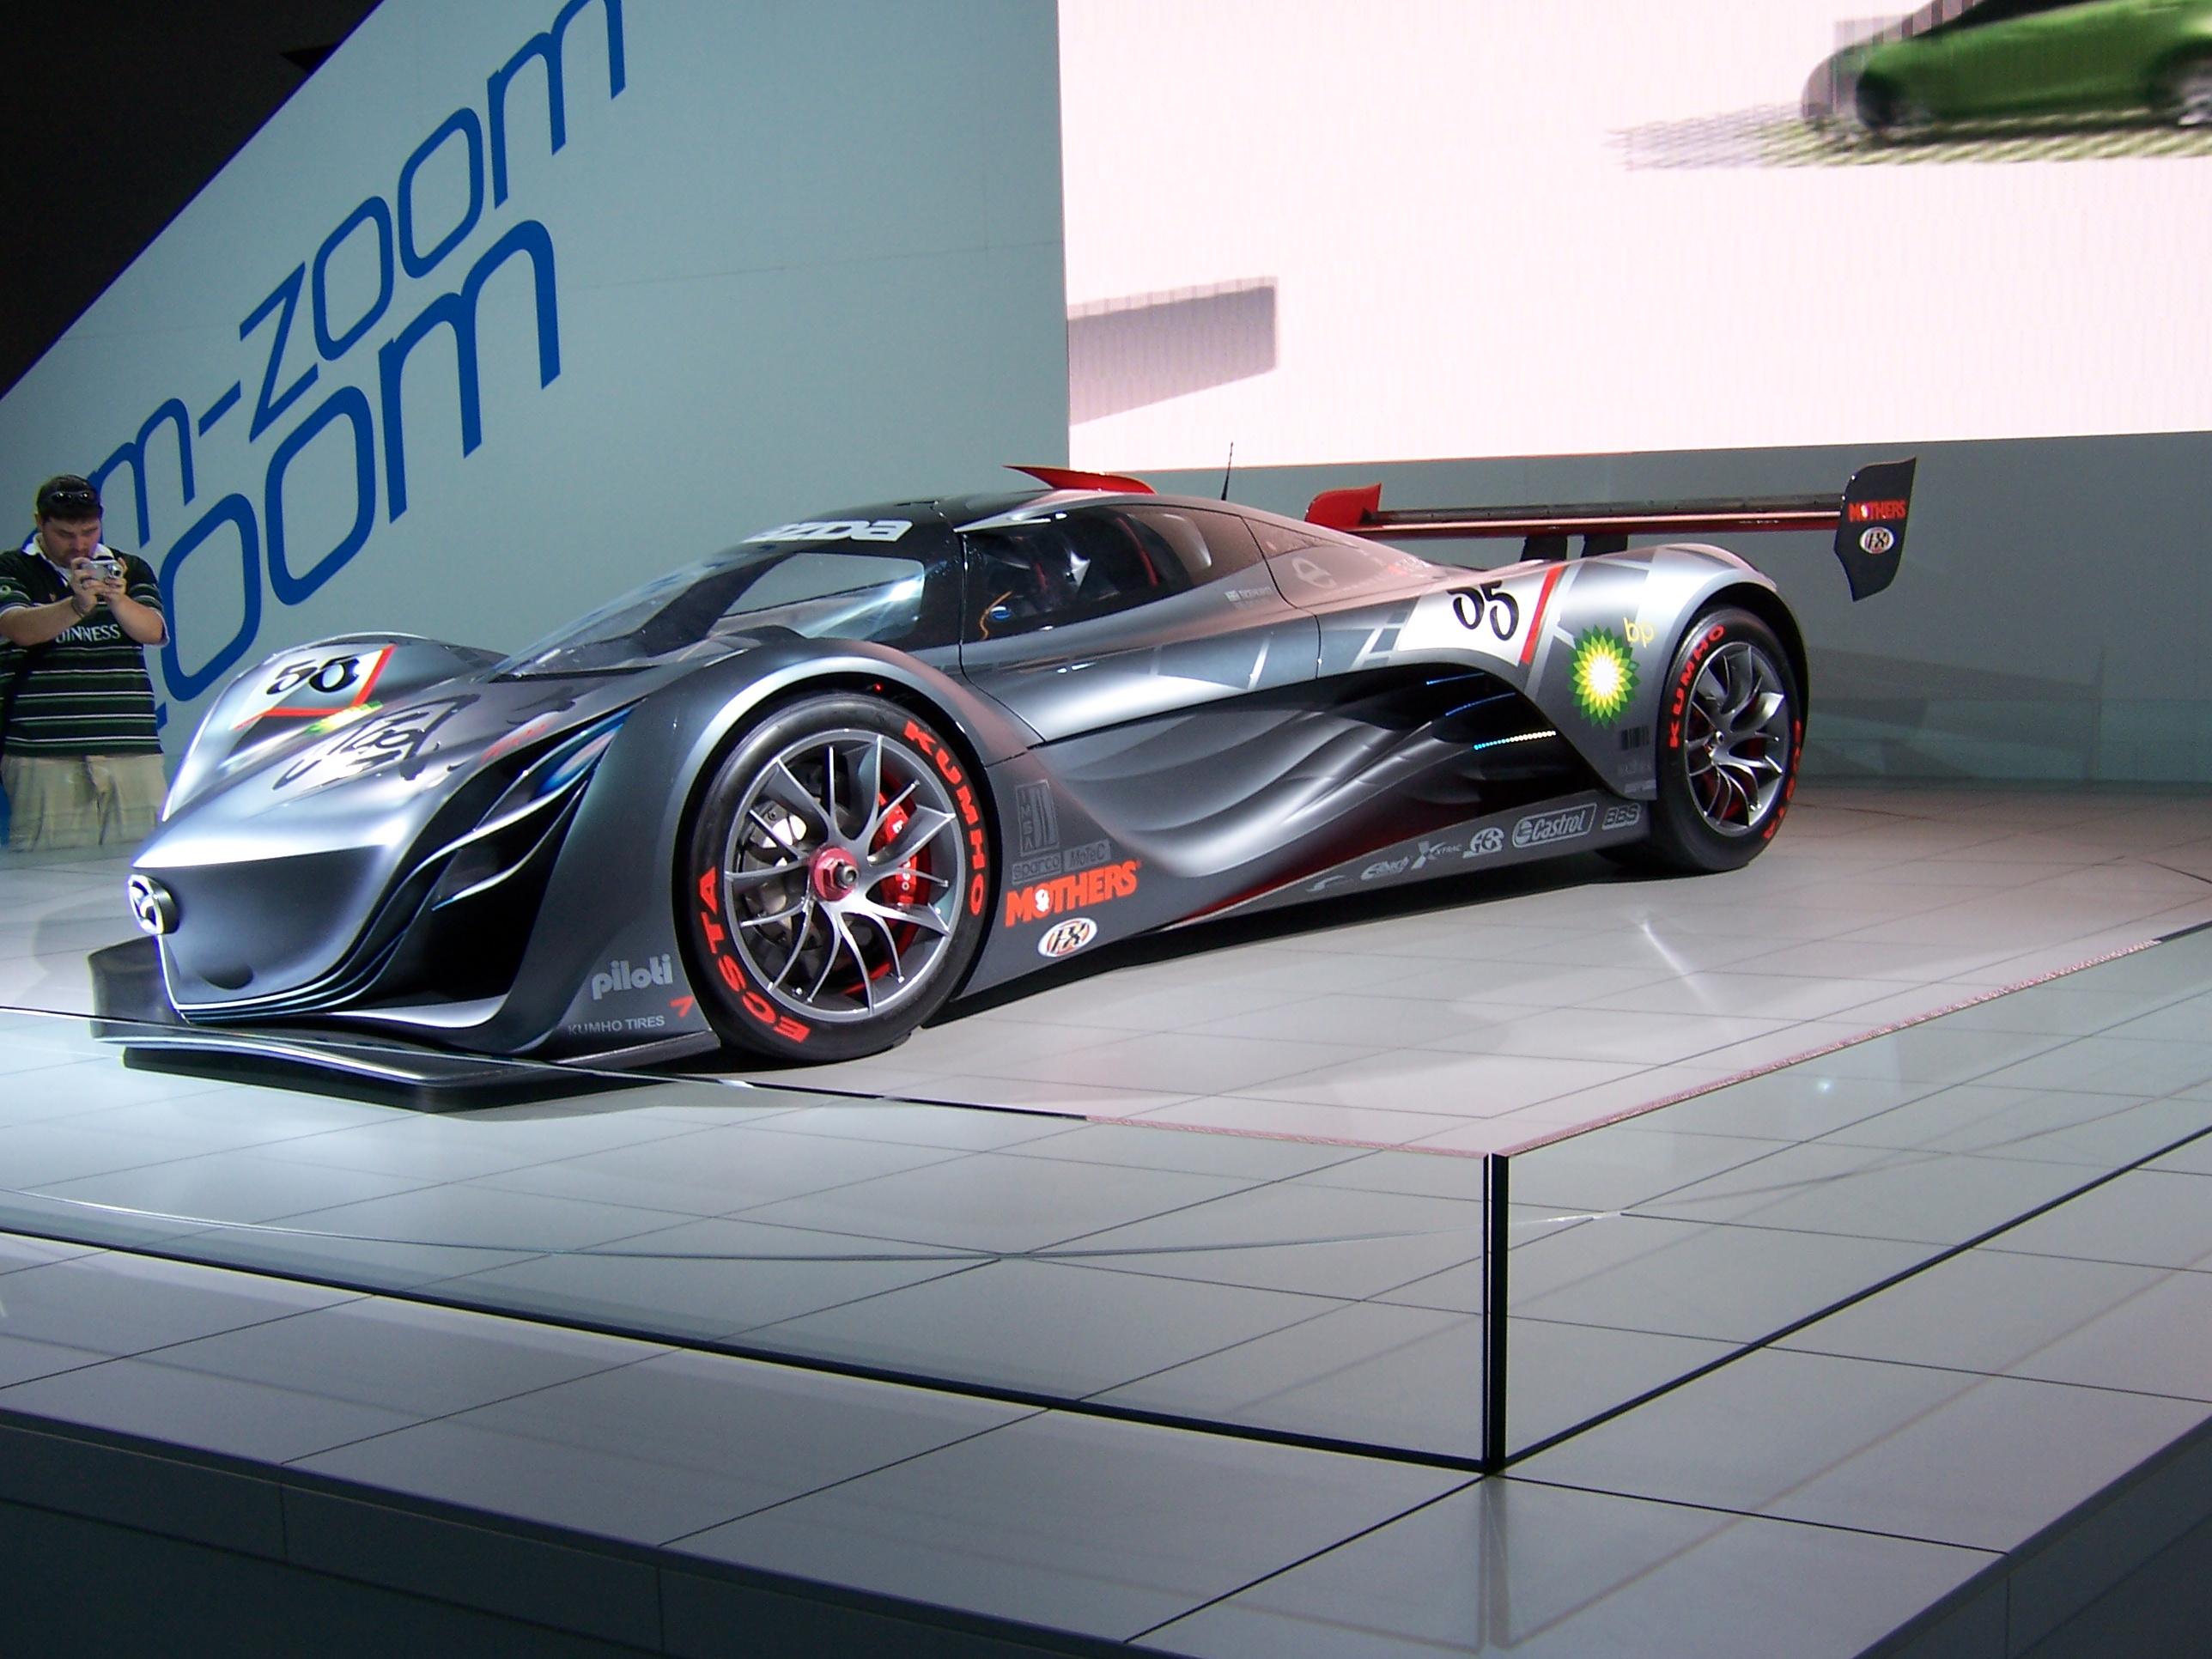 File:Mazda Furai Concept - Flickr - Alan D.jpg - Wikimedia Commons